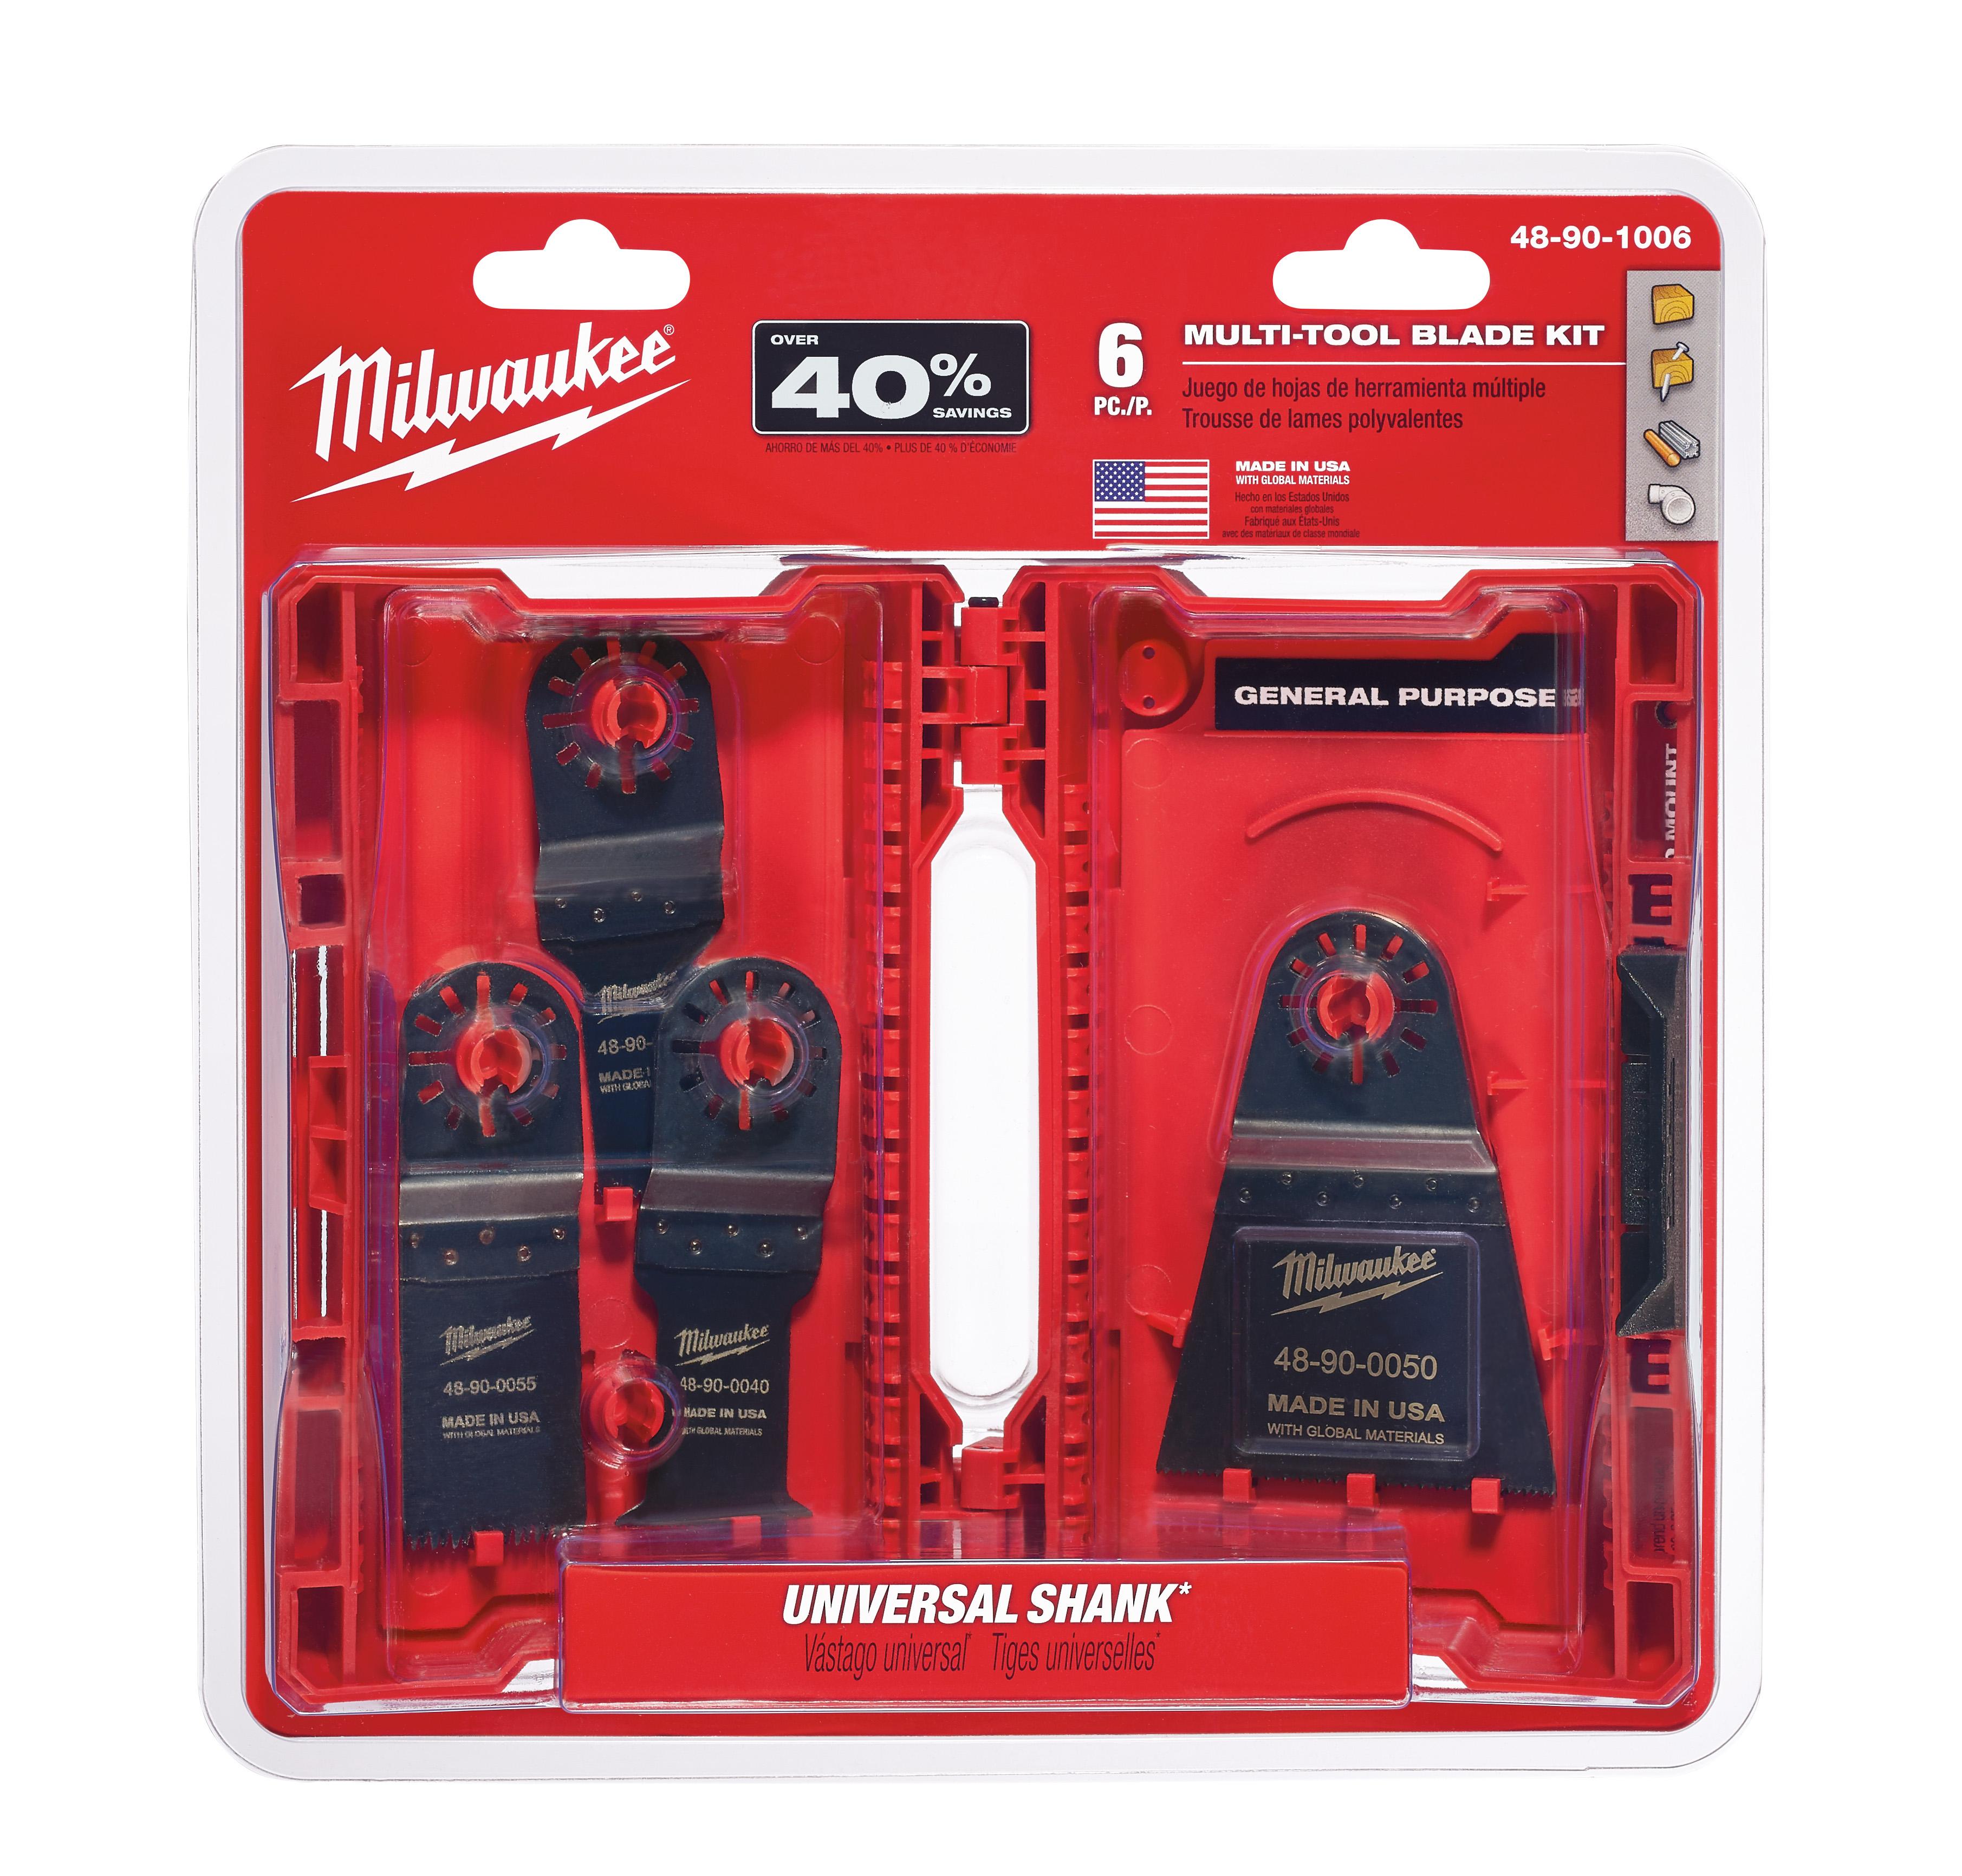 Milwaukee® 48-90-1006 Multi-Tool Blade Kit With Universal Shank, For Use With Milwaukee®, Bosch® (Non-Starlock™), SKIL®, Makita®, Craftsman®, Fein® (Non-Starlock™), Ridgid®, AEG®, Ozito® and Ryobi® Professional Grade Oscillating Multi-Tool